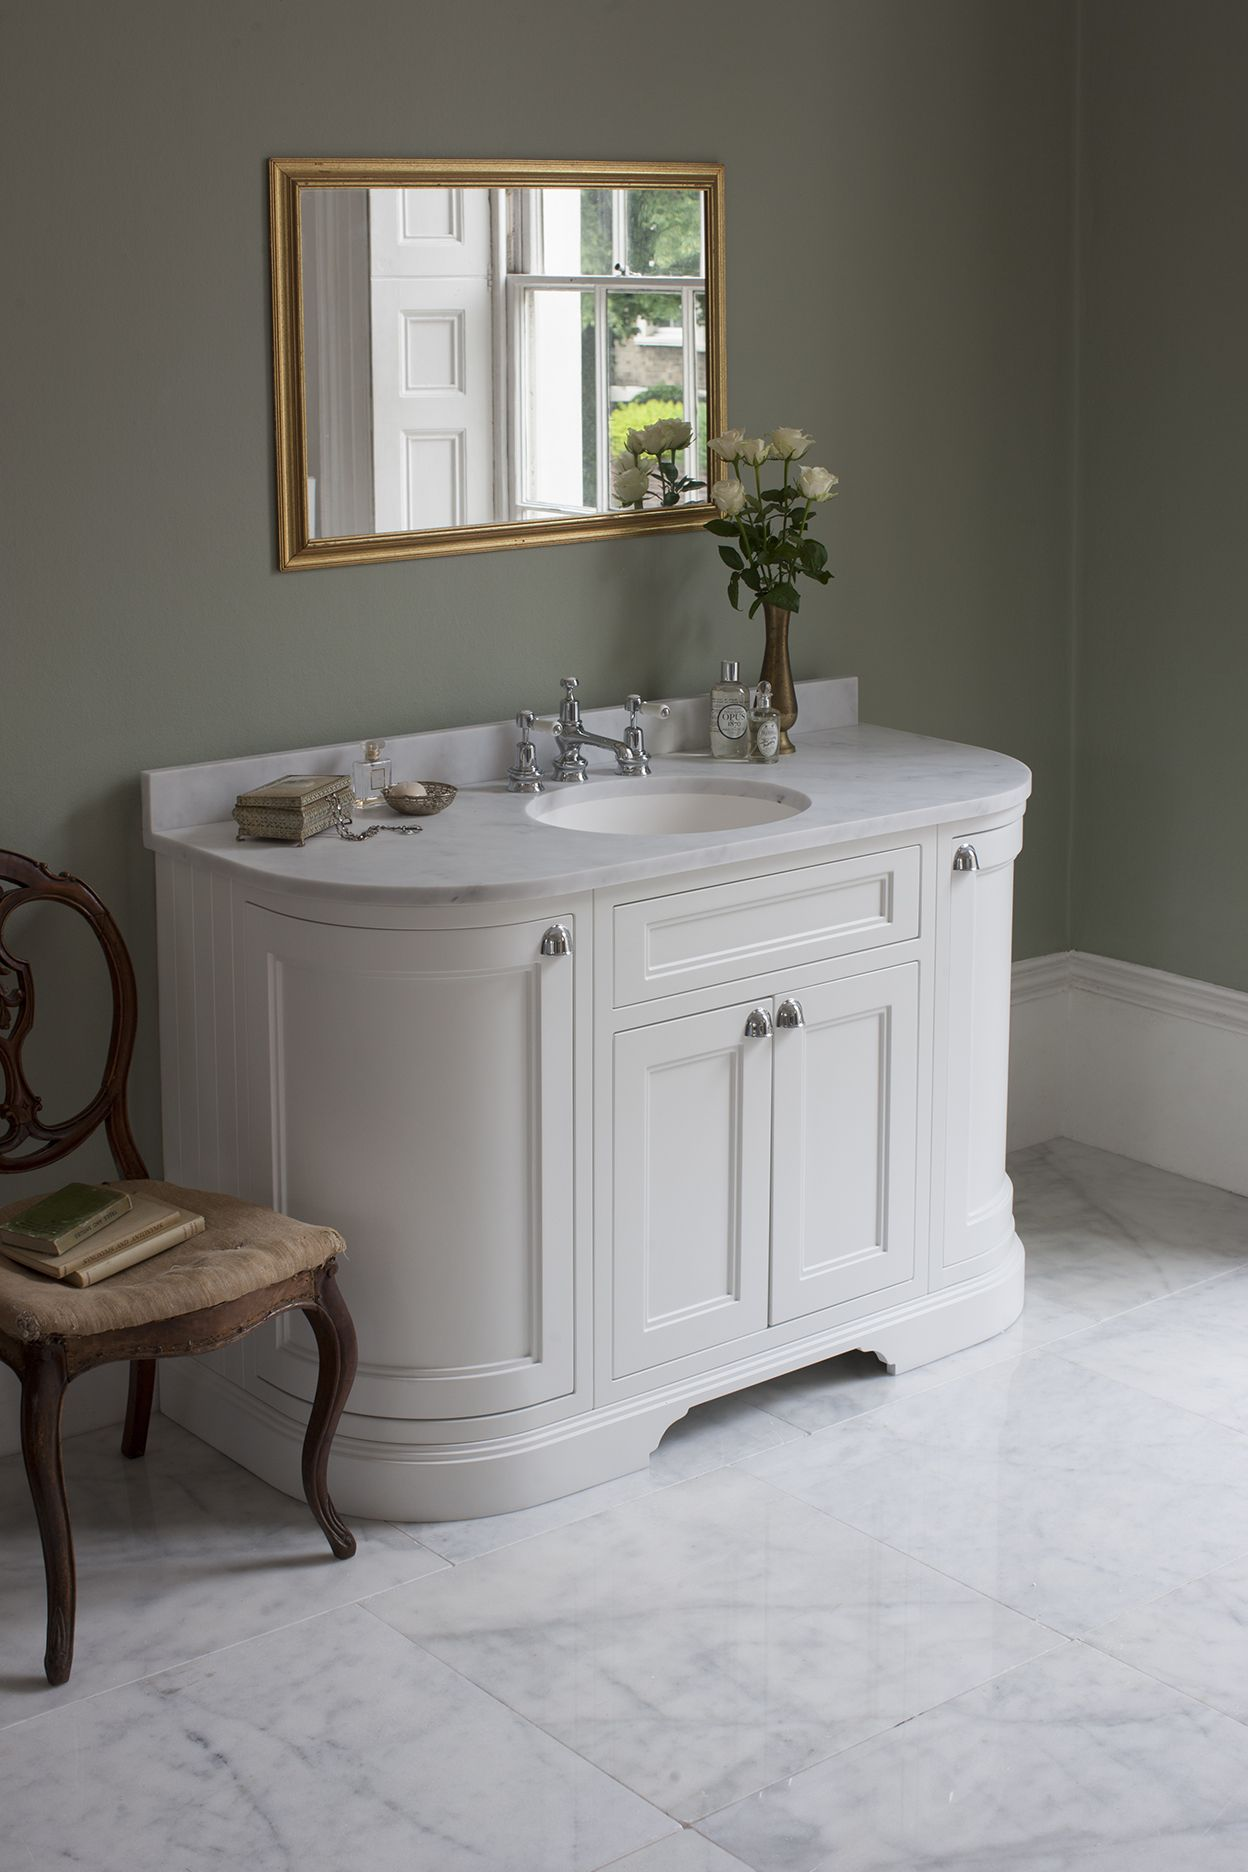 Freestanding 134 Curved Unit With Carrara White Worktop Drawers Integrated White Basin Matt White Sku Fc4w Bc13 Bathroom Vanity Units Freestanding Vanity Unit Vanity Units